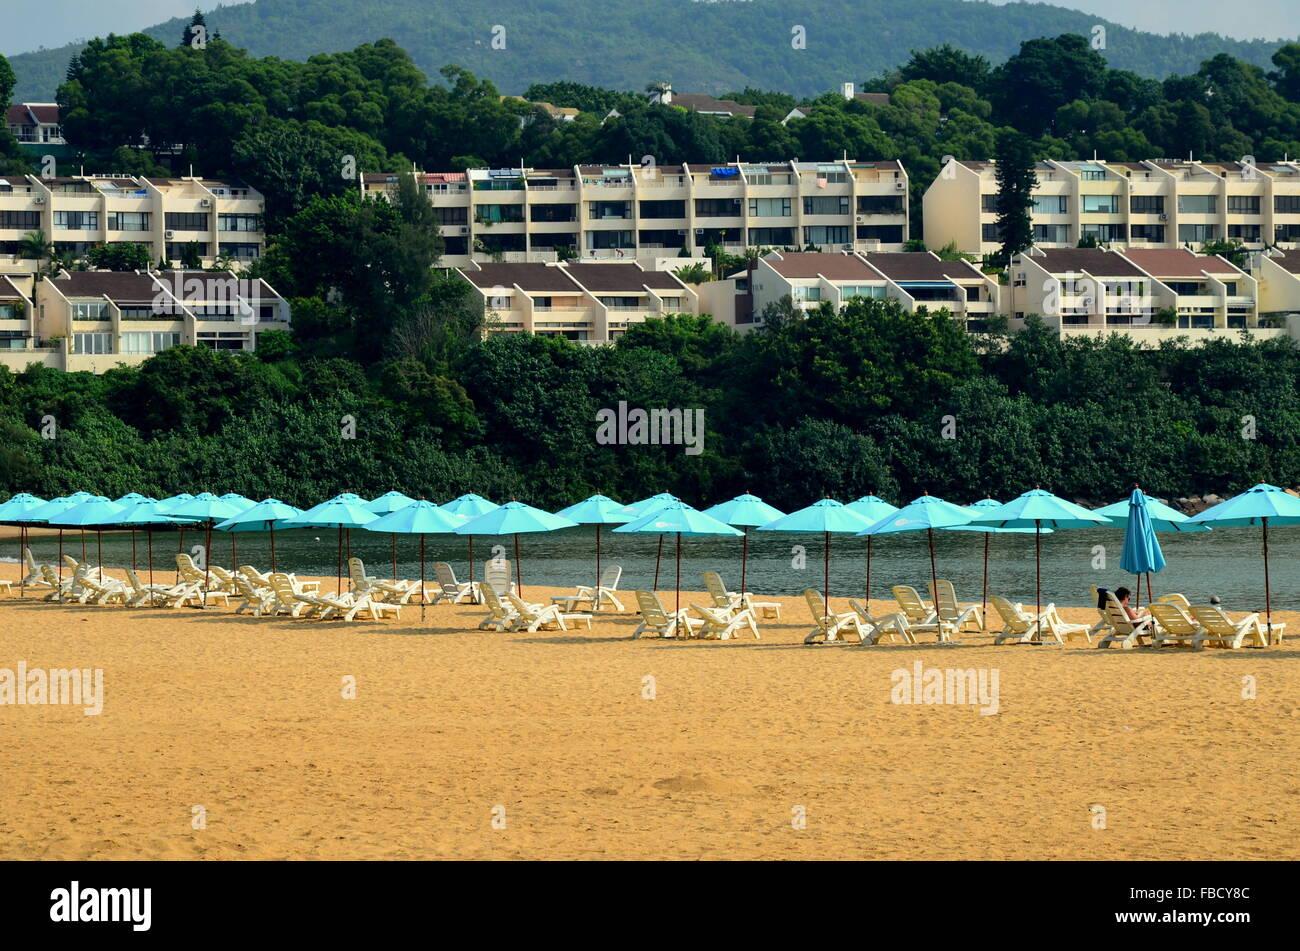 Blue Umbrellas on the beach - Stock Image